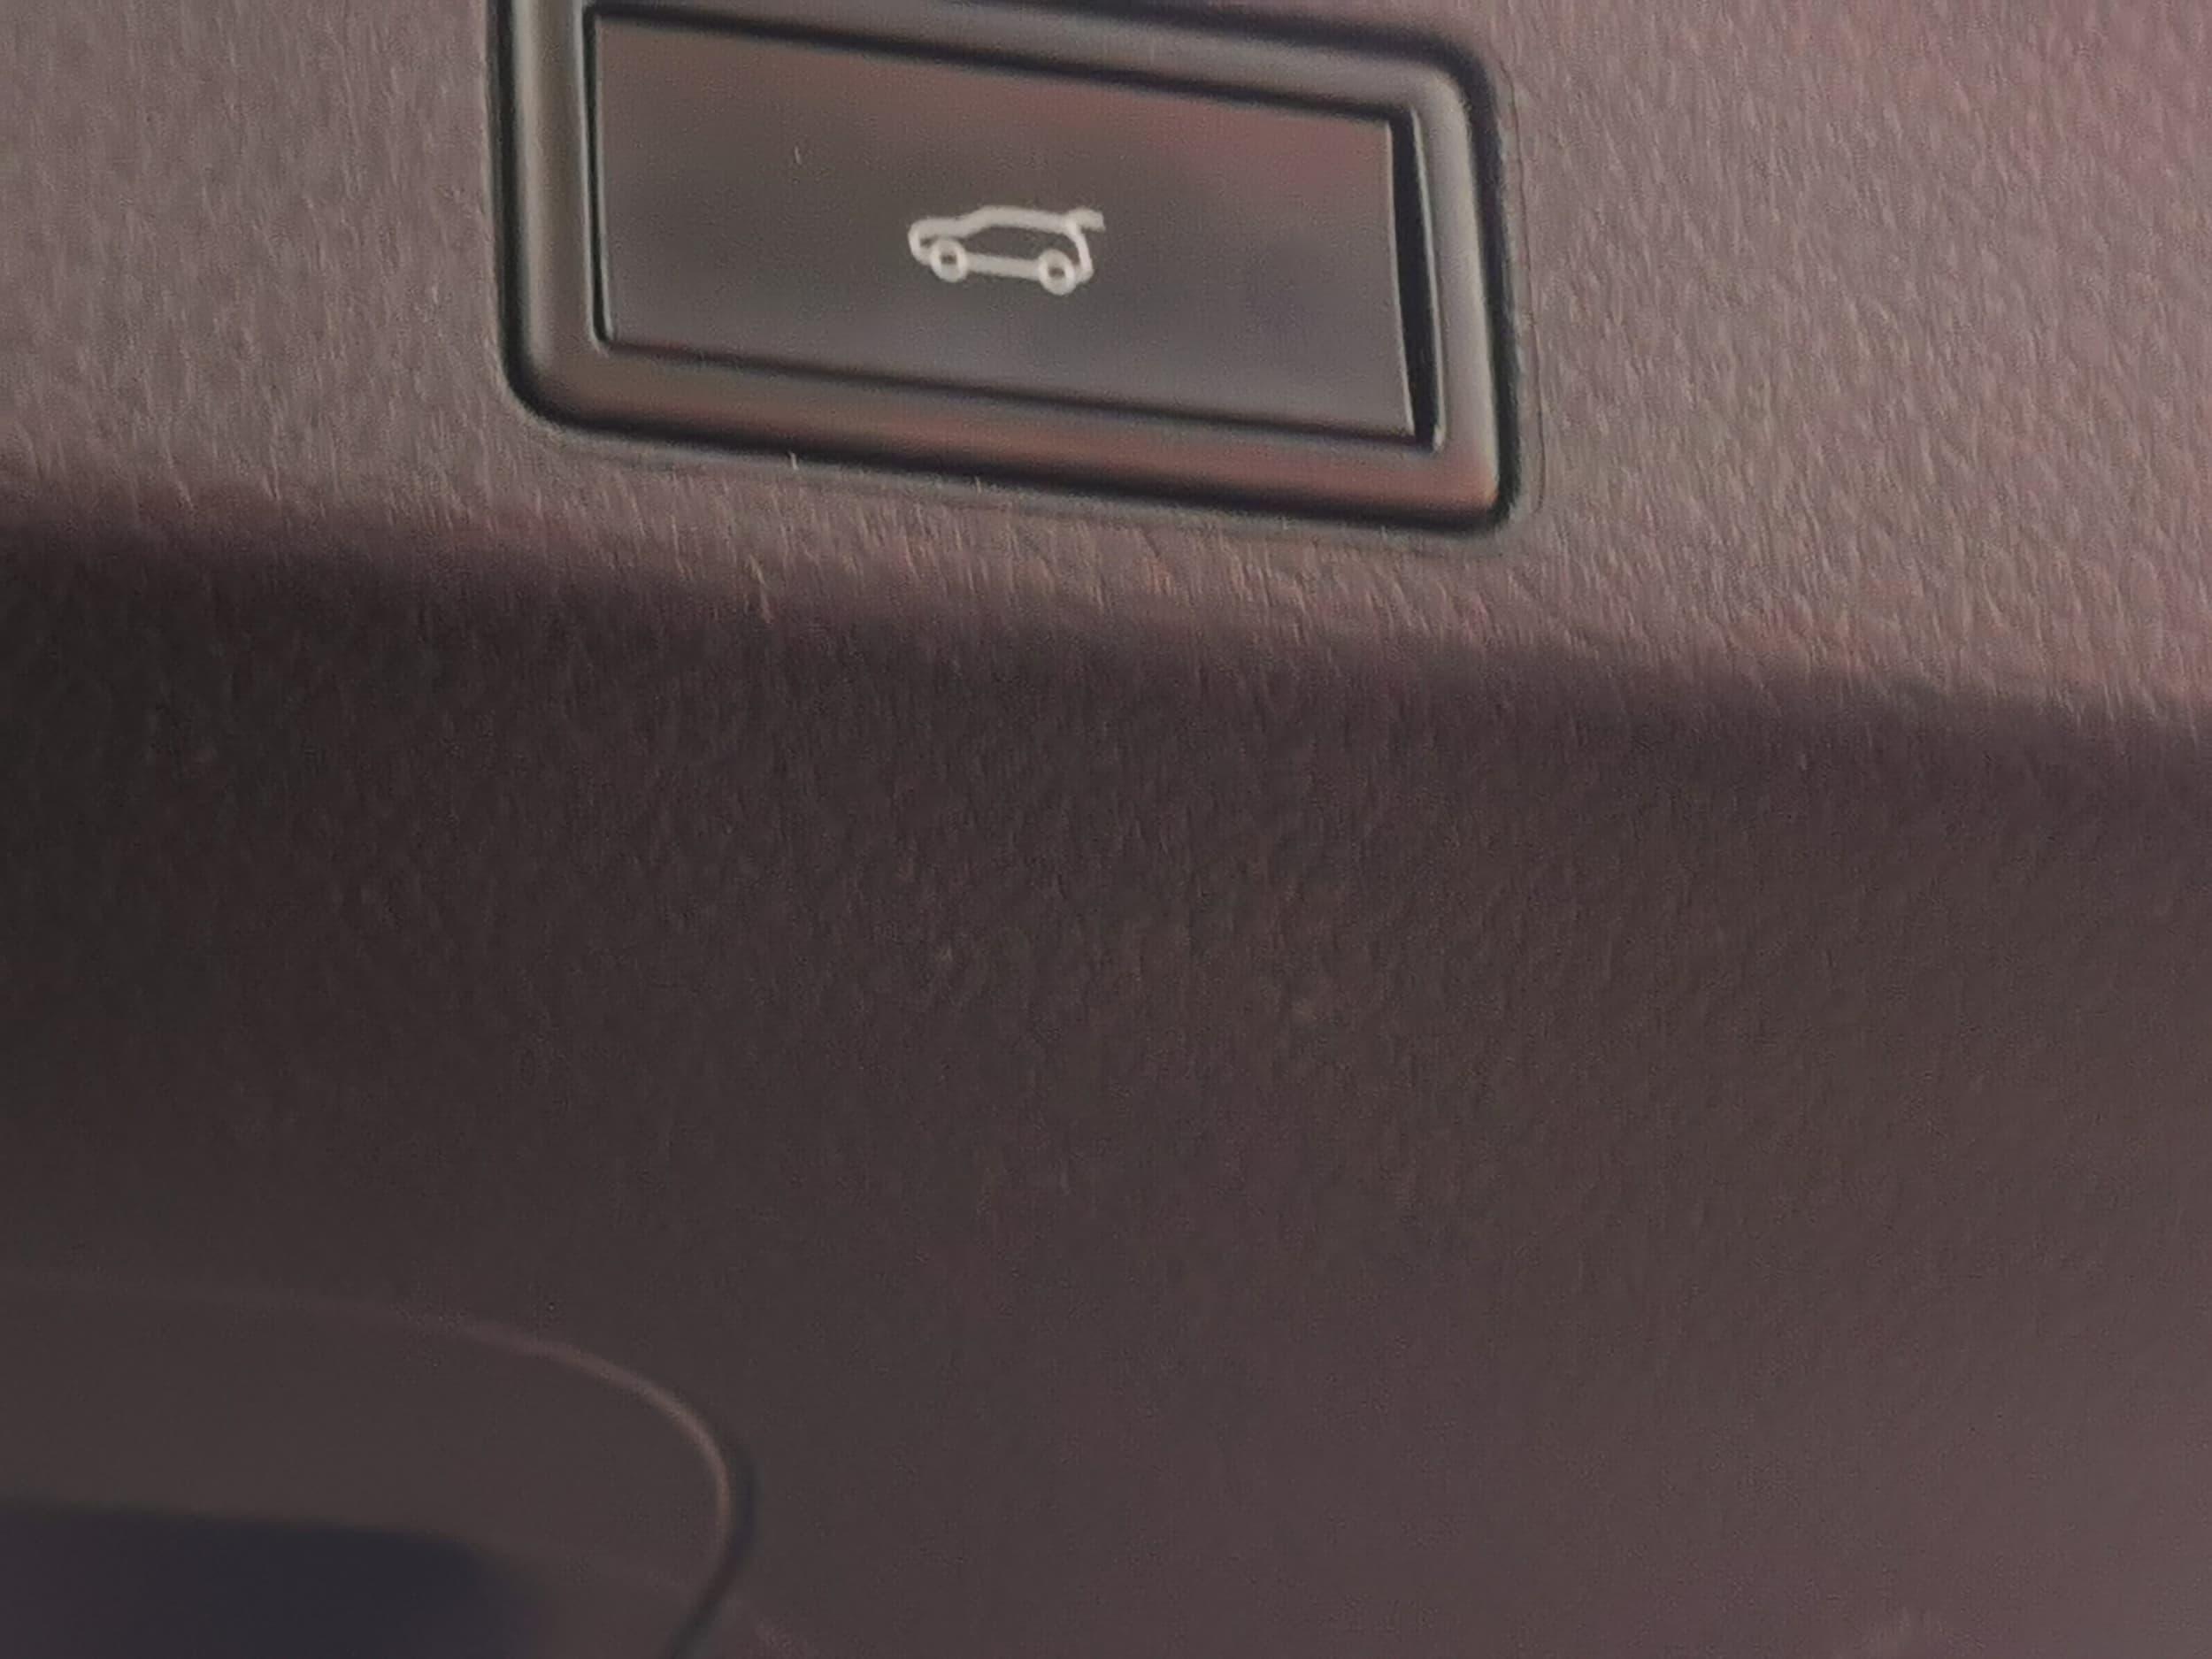 2015 Volkswagen Touareg V6 TDI 7P Auto 4MOTION MY16 - image 22